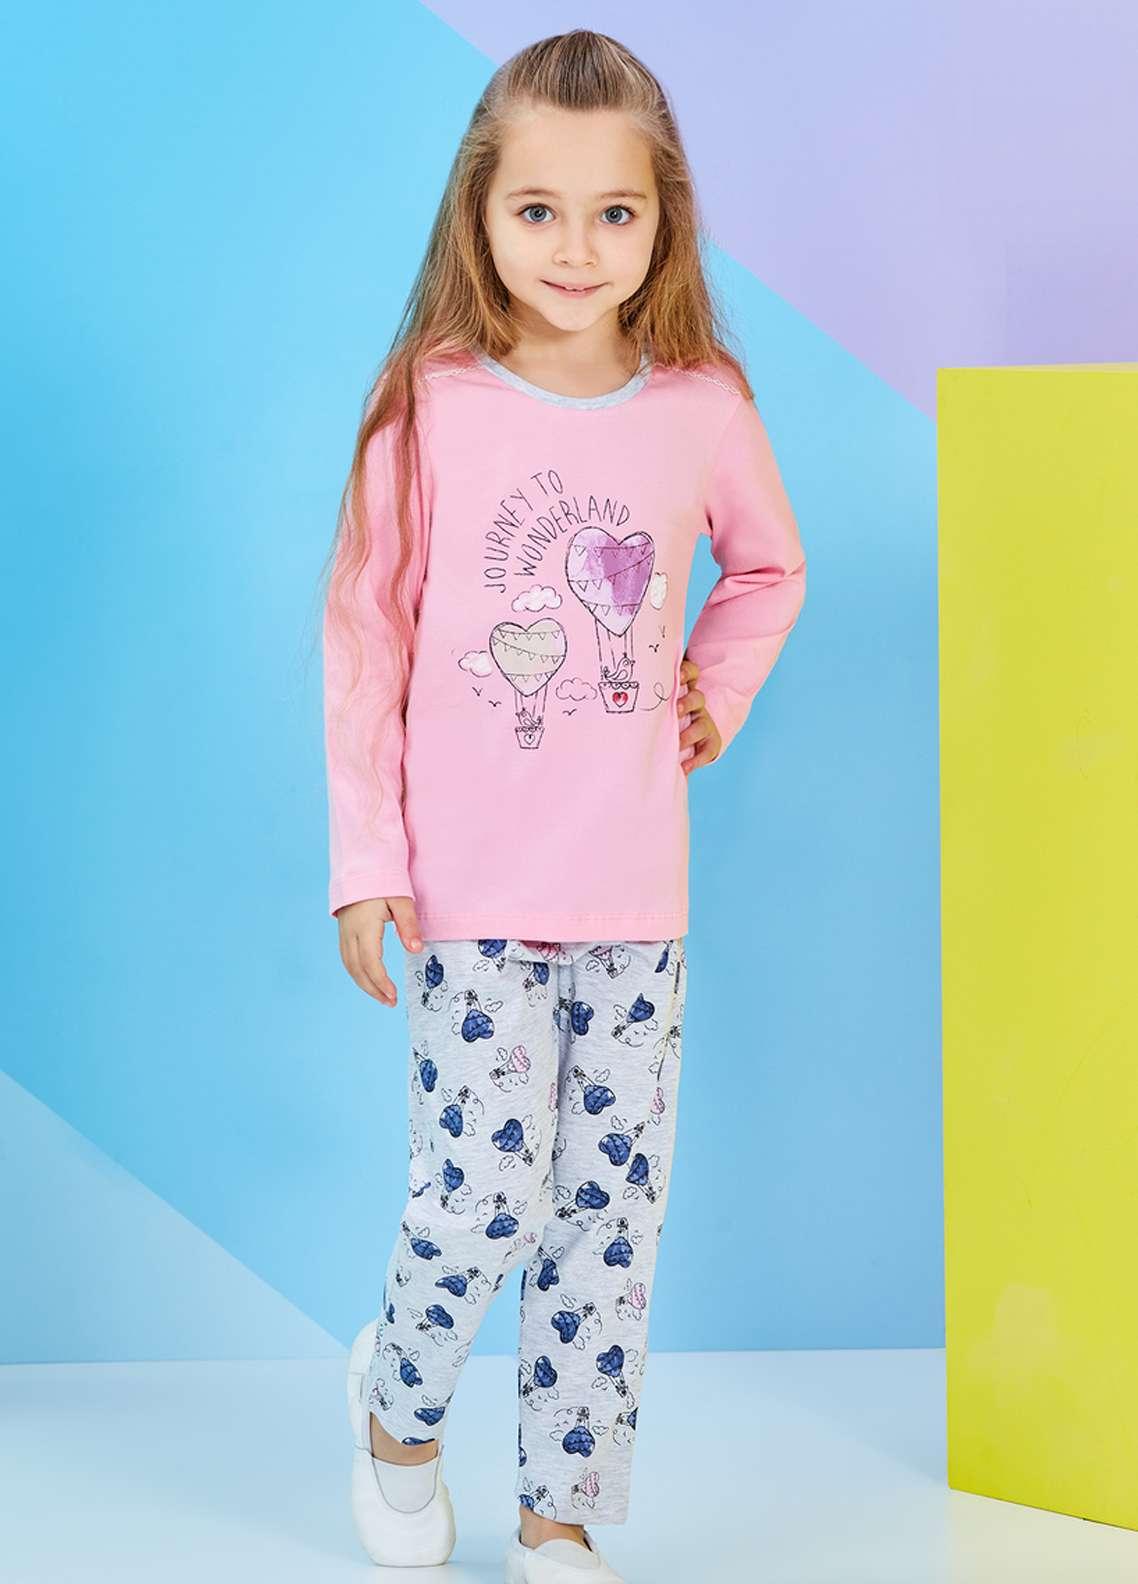 Cotton Net Nightwear for Kids 2 Piece NS18K 1251 PINK